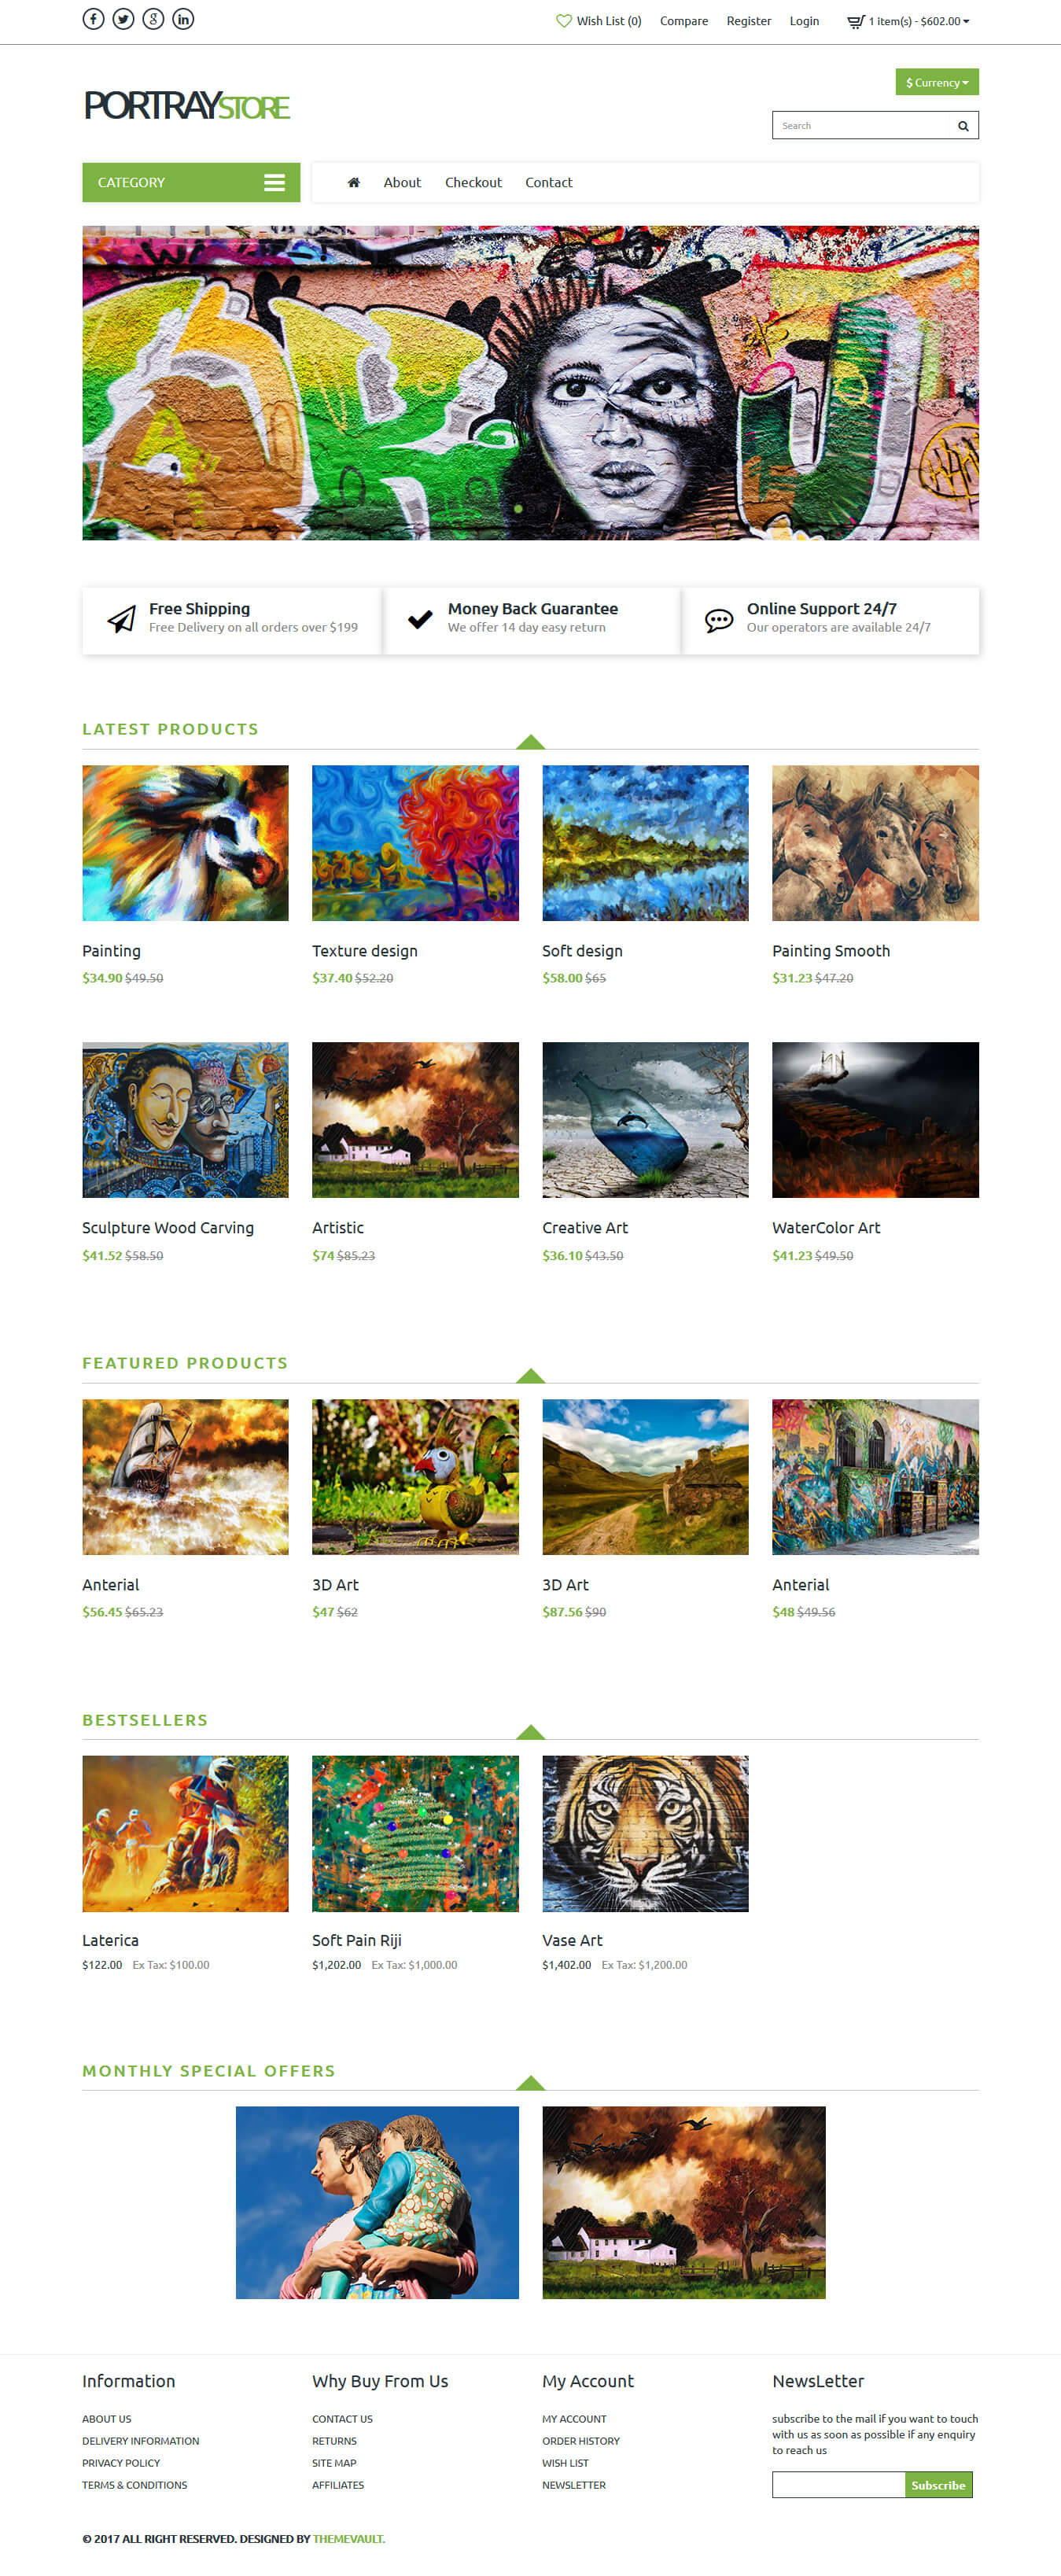 Portraystore – Responsive Art Gallery Website Design Template